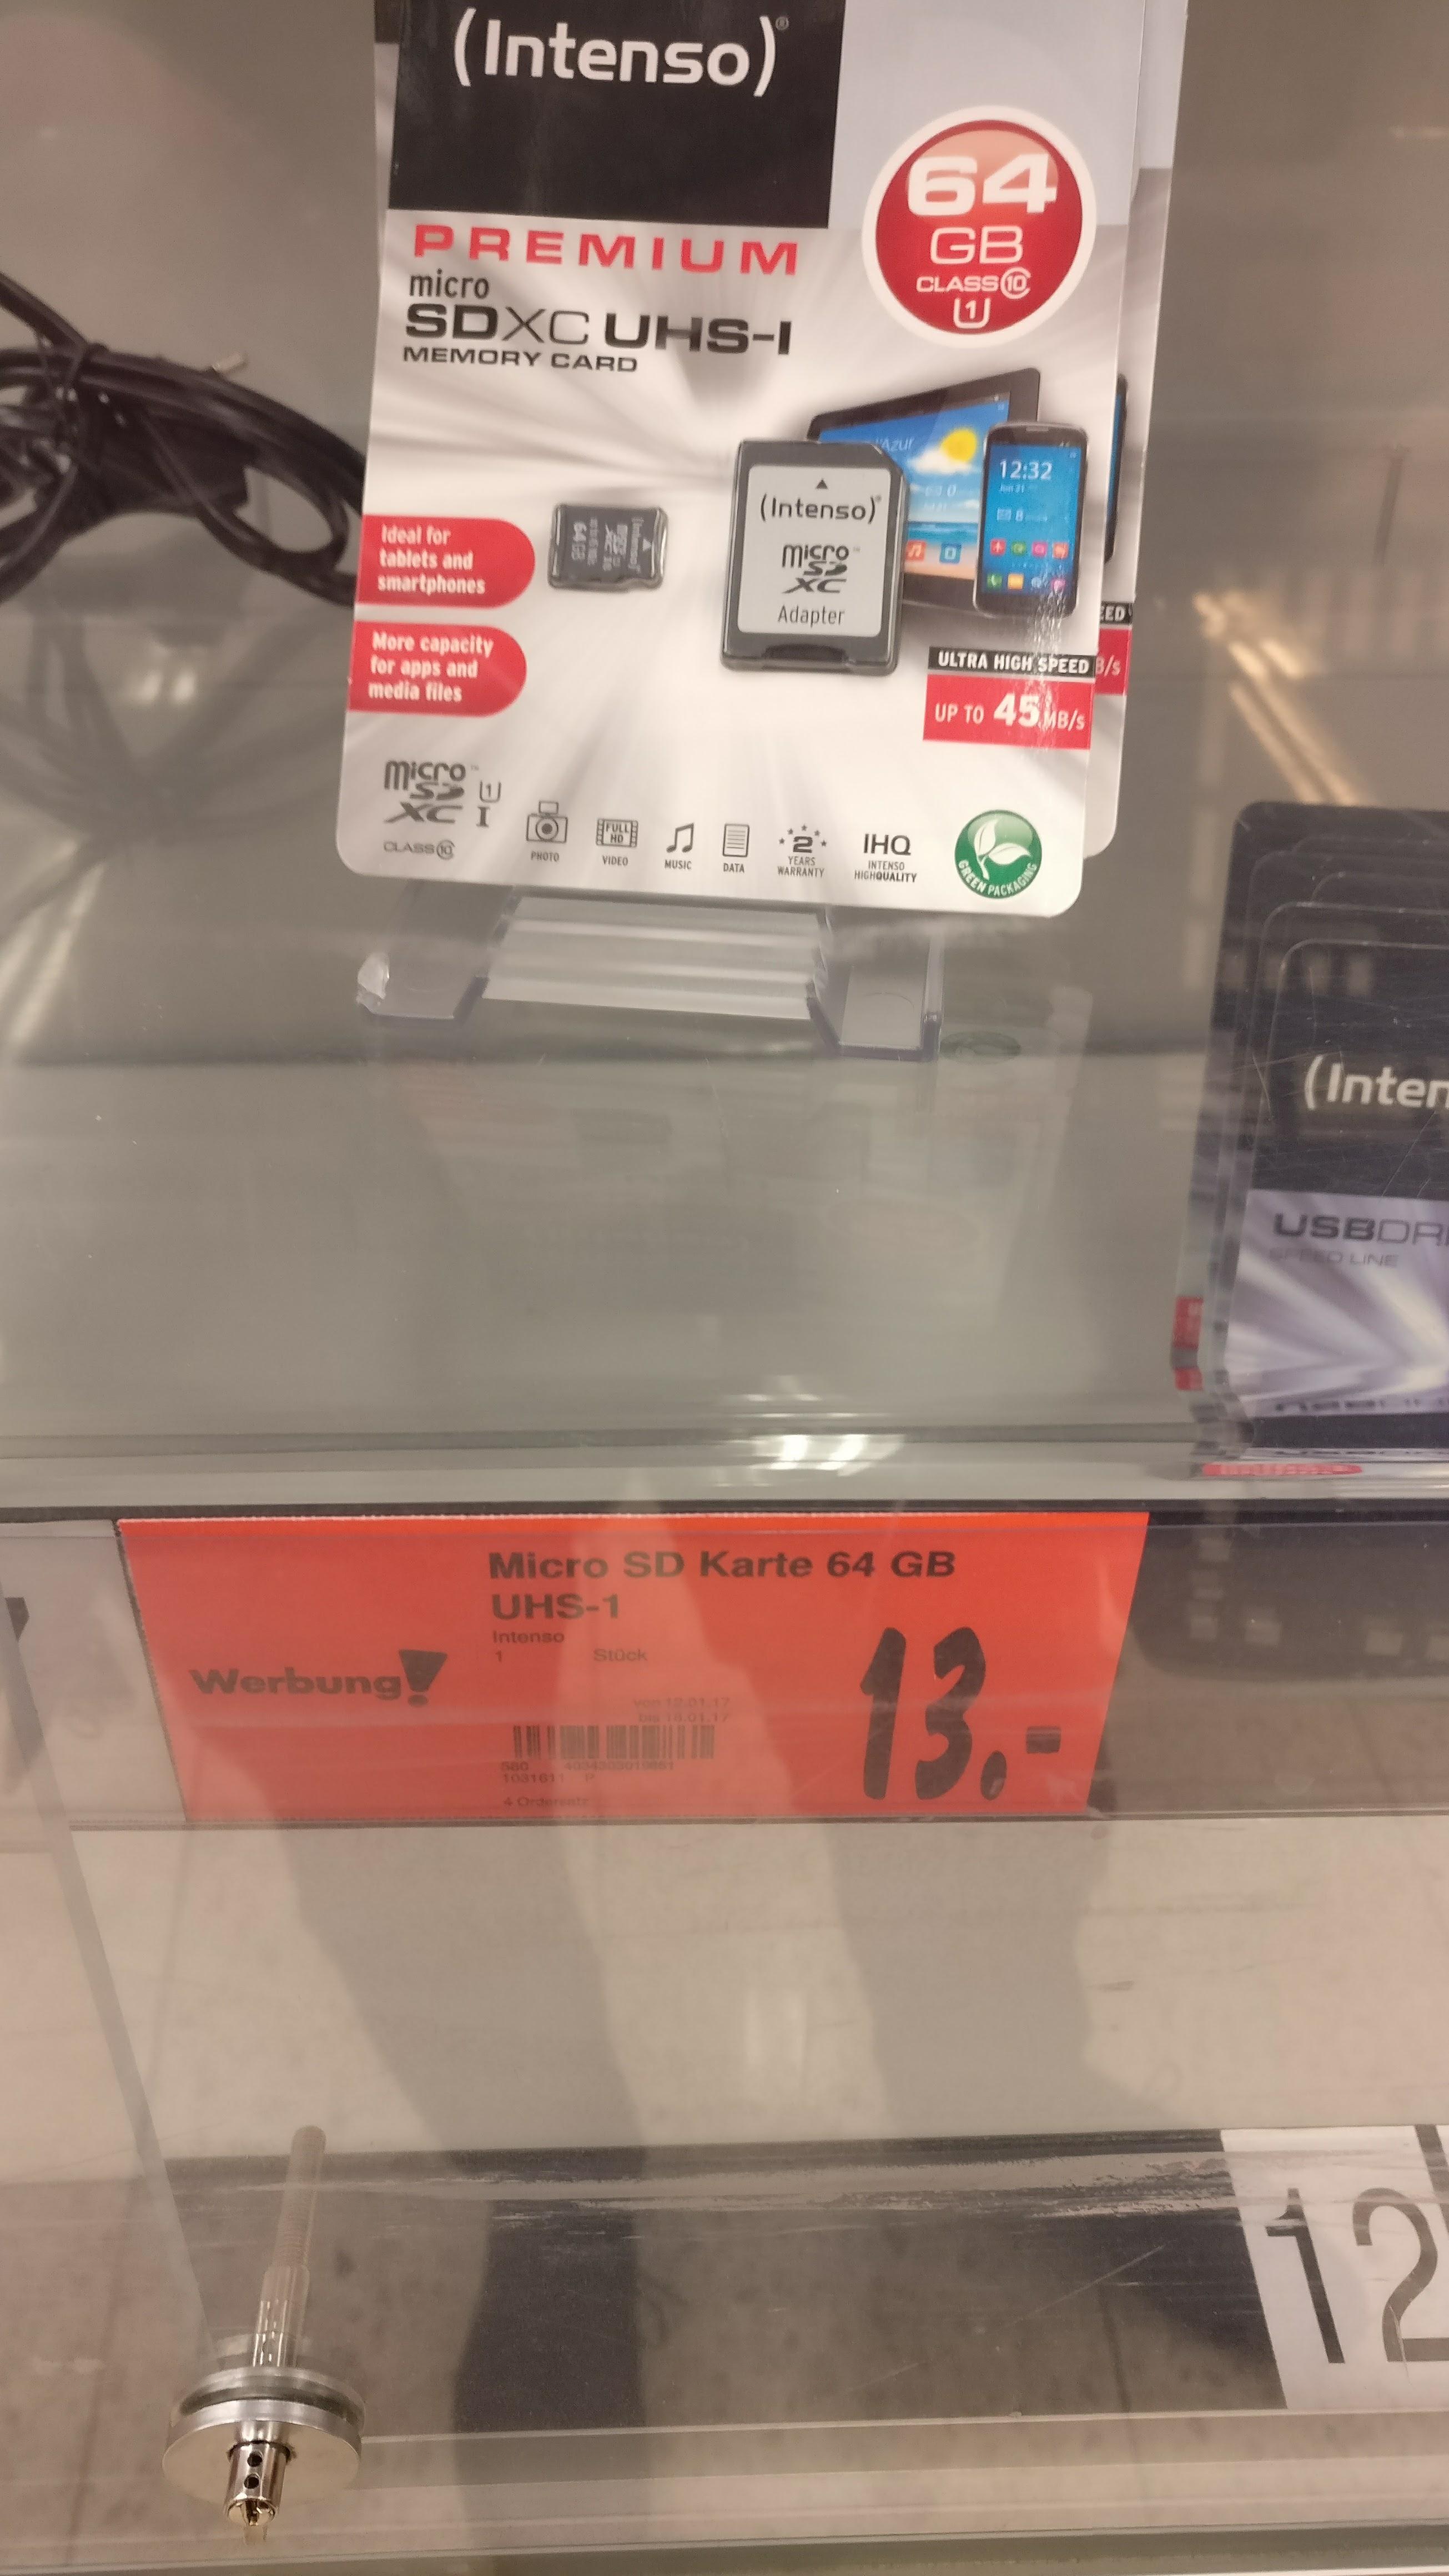 Lokal Kaufland Siegen Intenso Micro-SD 64GB